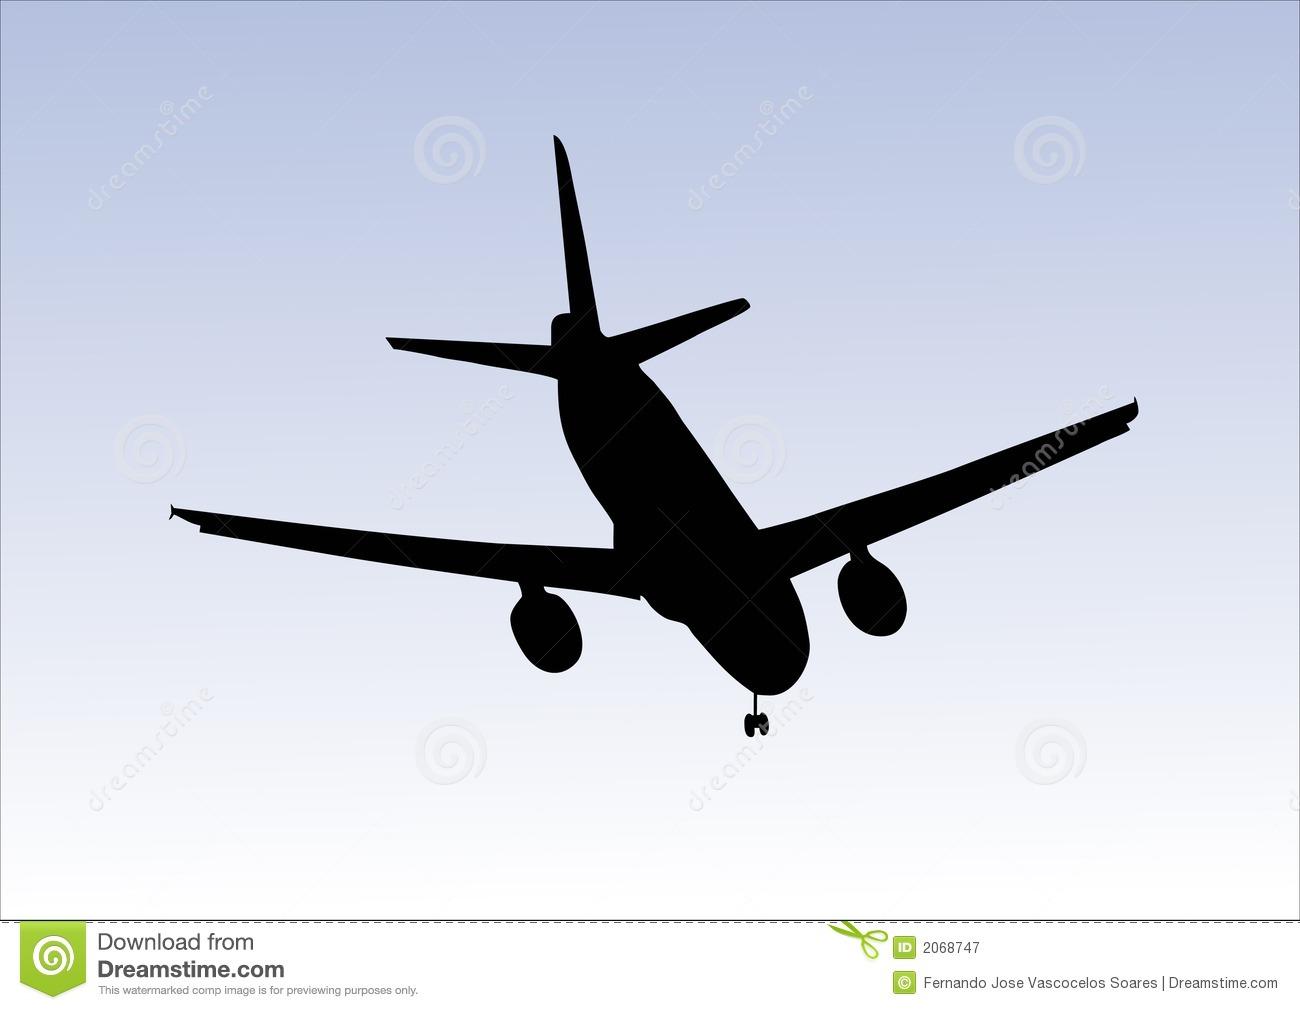 Clipart plane landing banner transparent library Aeroplane Landing Royalty Free Stock Photography - Image: 2068747 banner transparent library